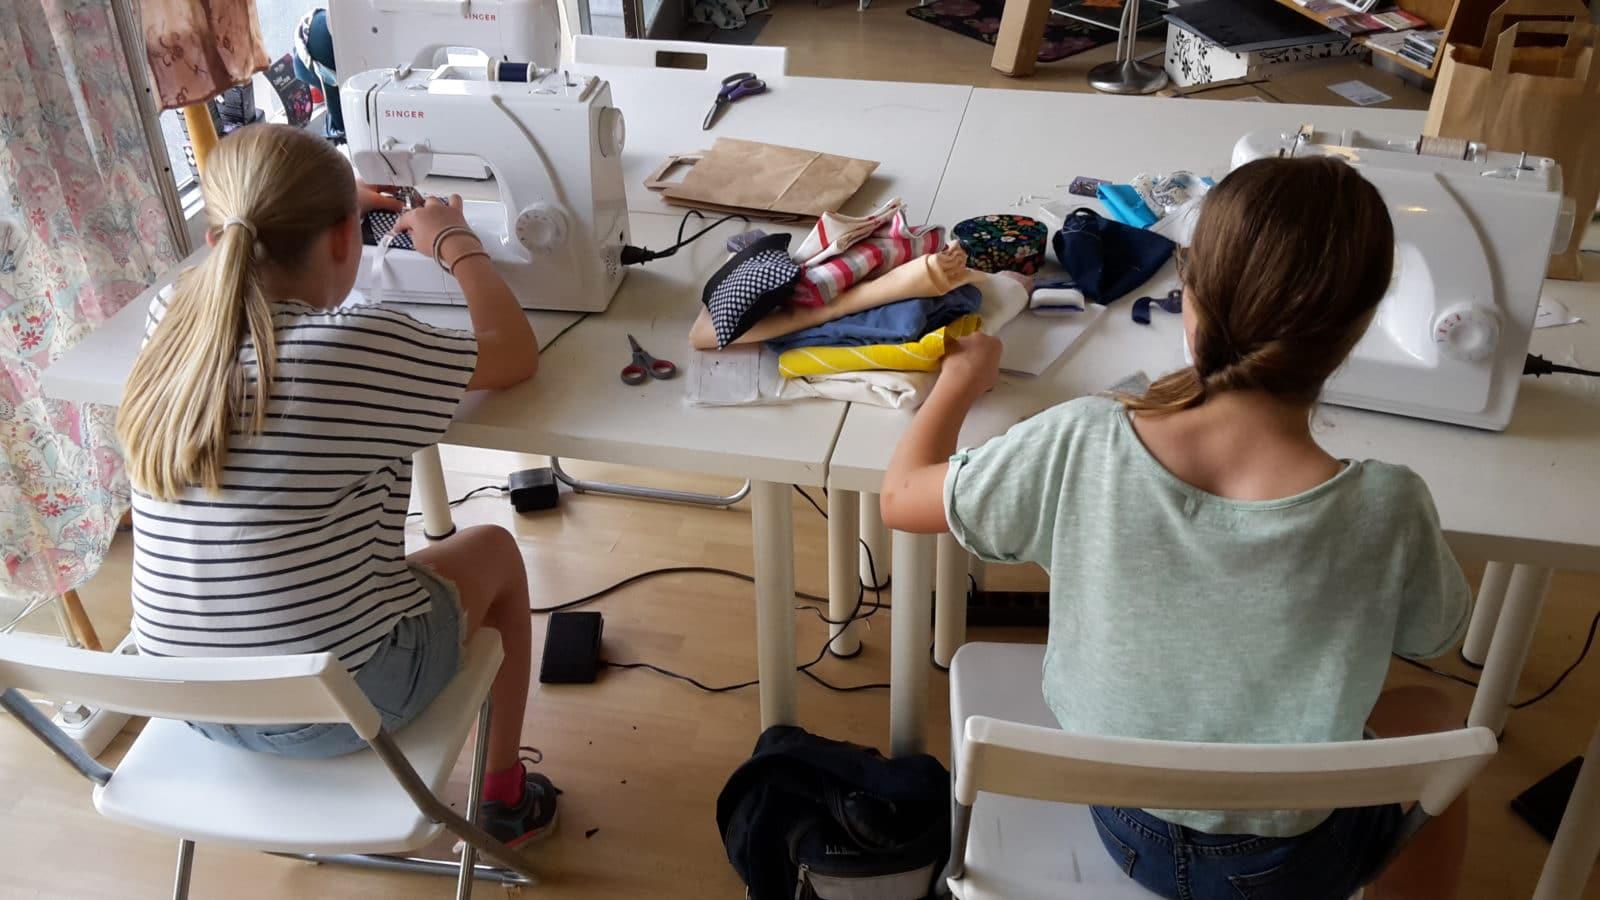 Kurs Nhkurse im Modeatelier Kayami Darmstadt  HANDMADE Kultur